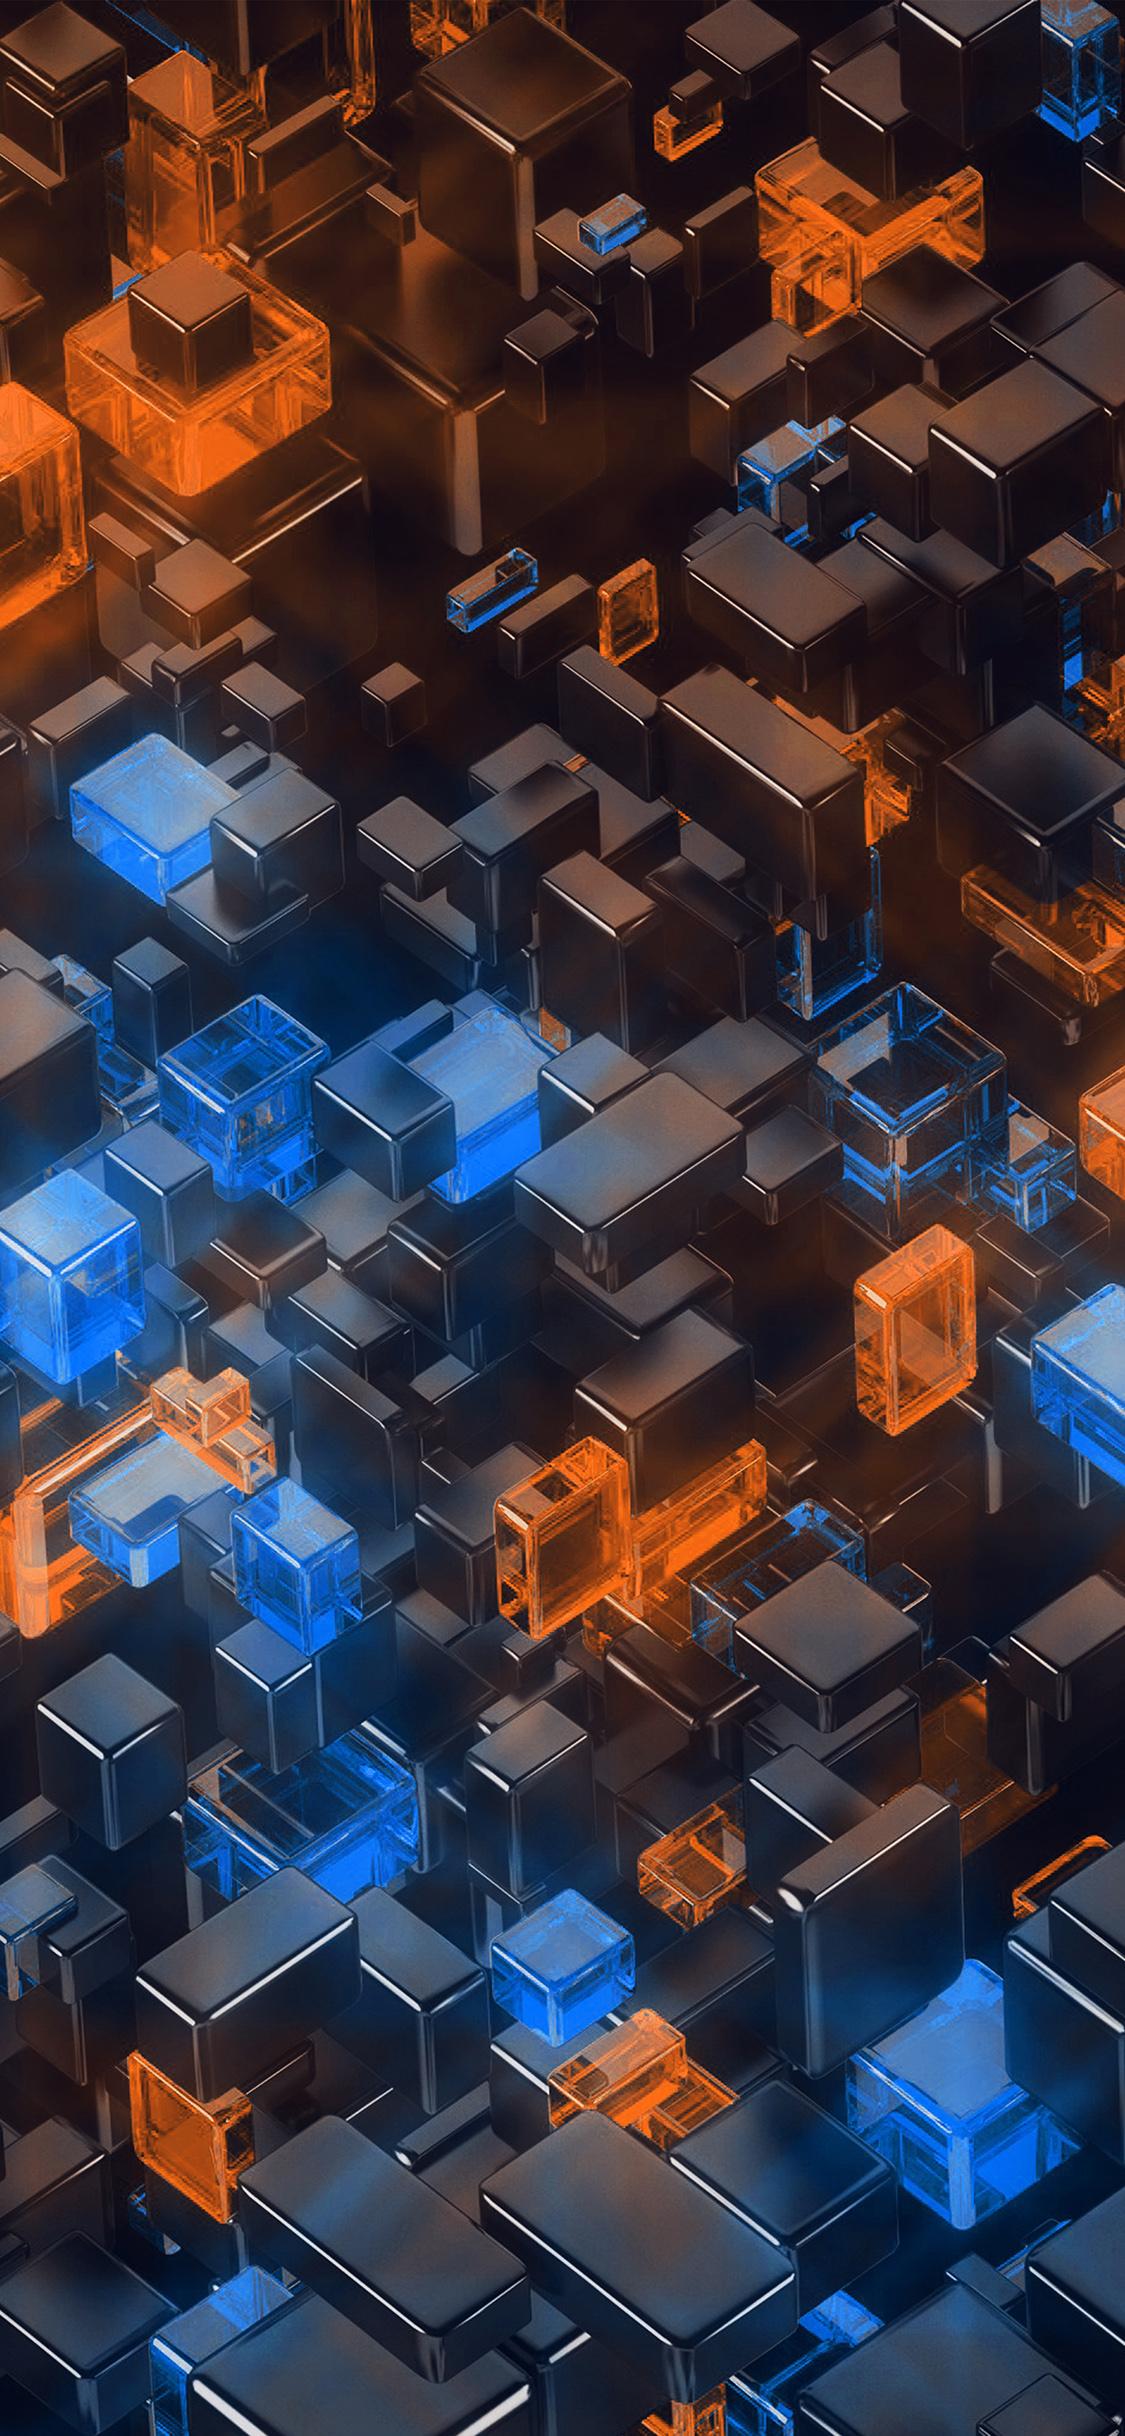 Vp41 Digital Art Blue Orange 3d Pattern Wallpaper